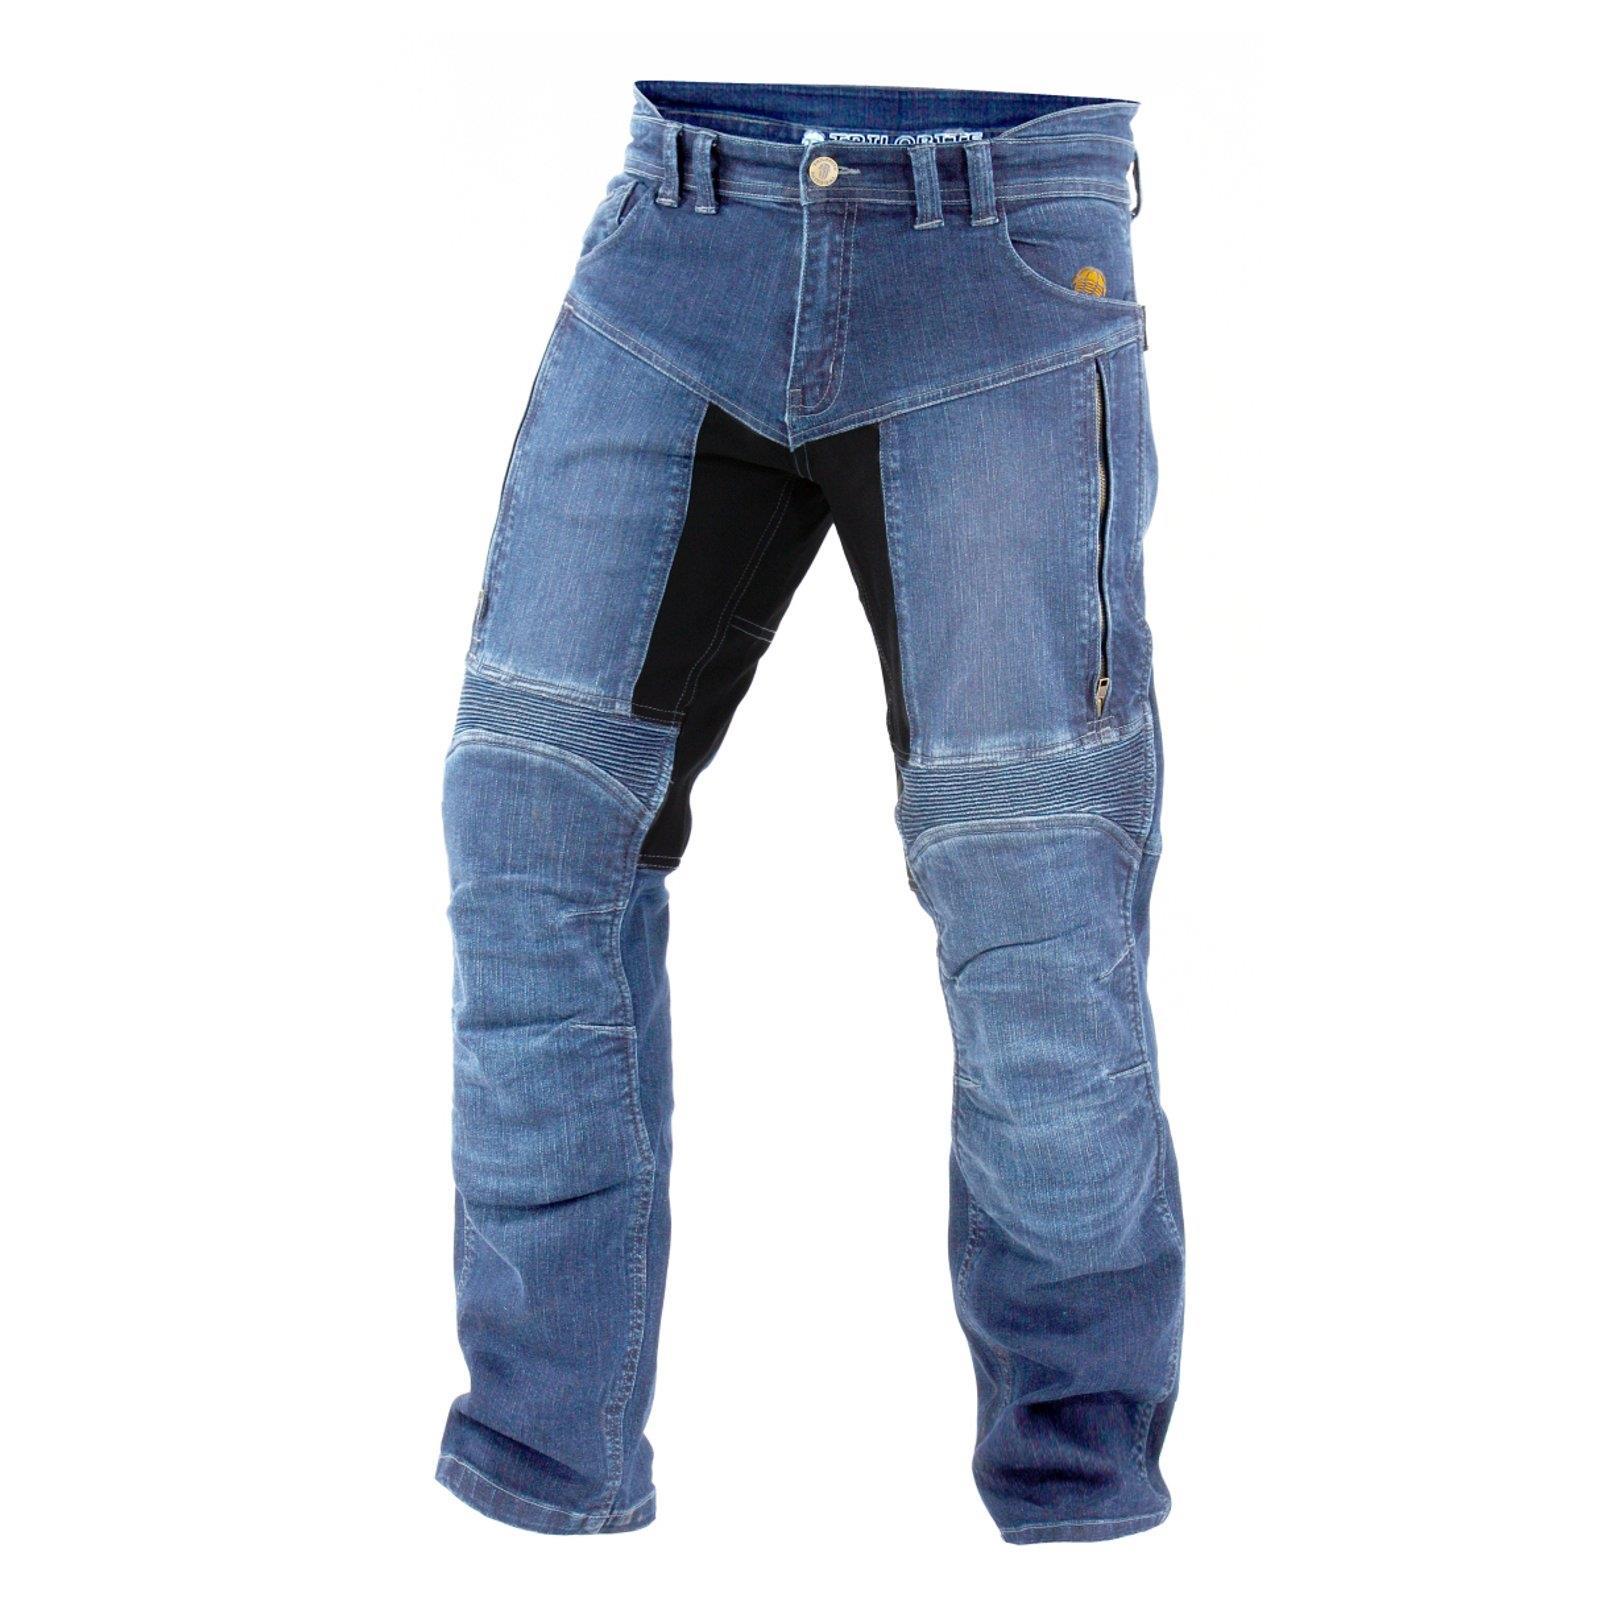 Trilobite-Pantaloni-Moto-Jeans-Abbigliamento-Parado-MICAS-URBAN-DUAL-PANTS-ACID miniatura 40